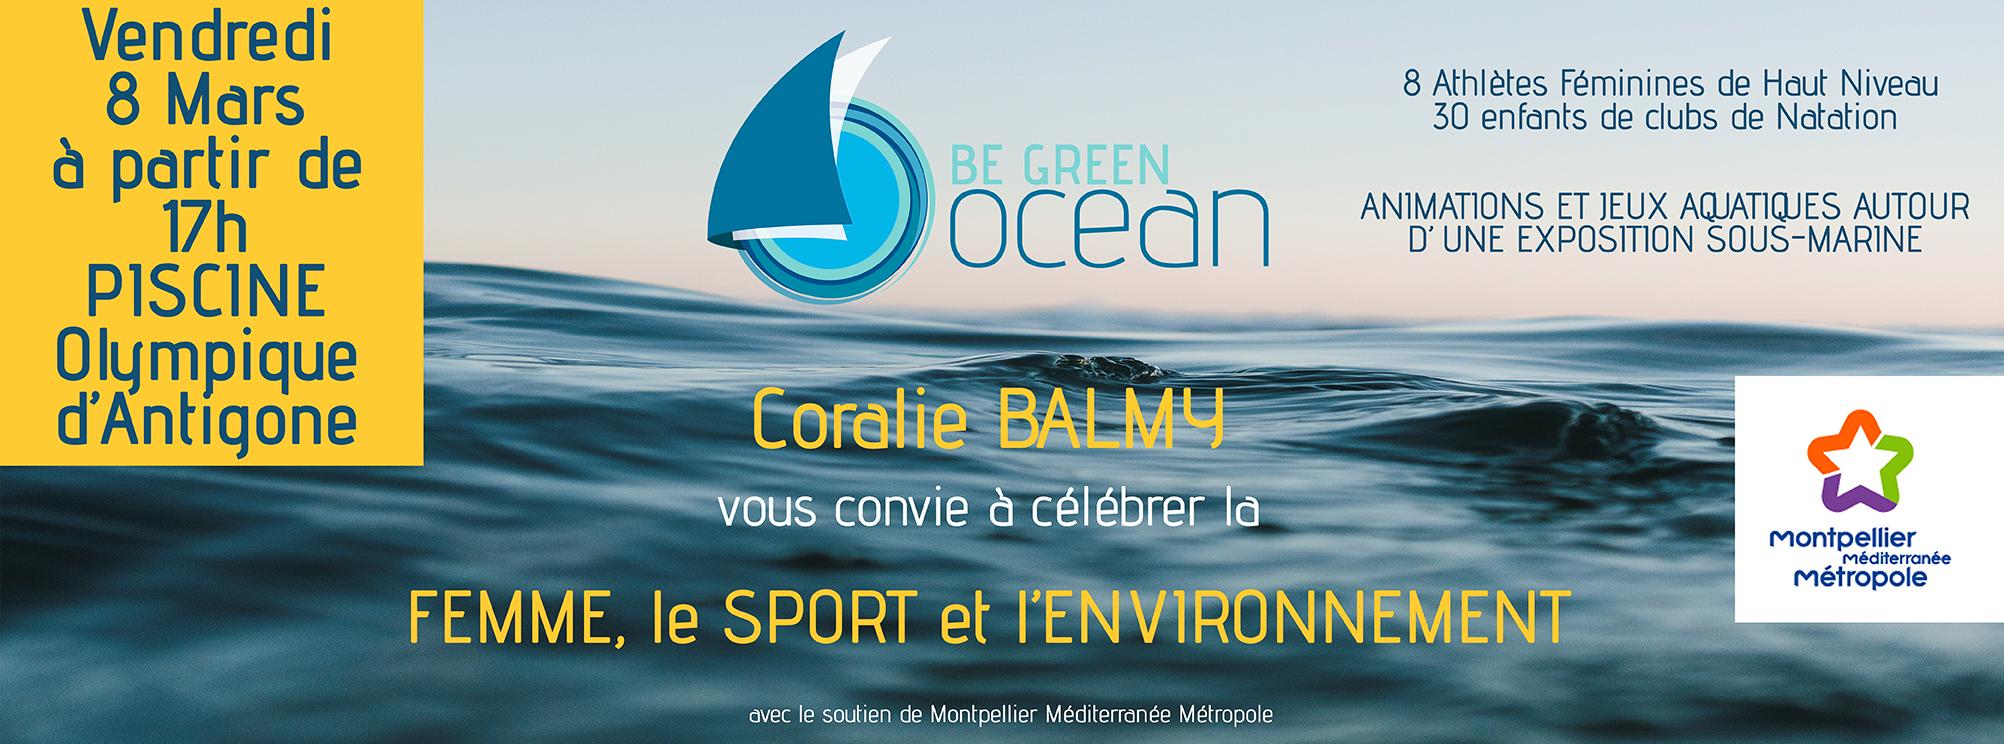 Be Green Océan